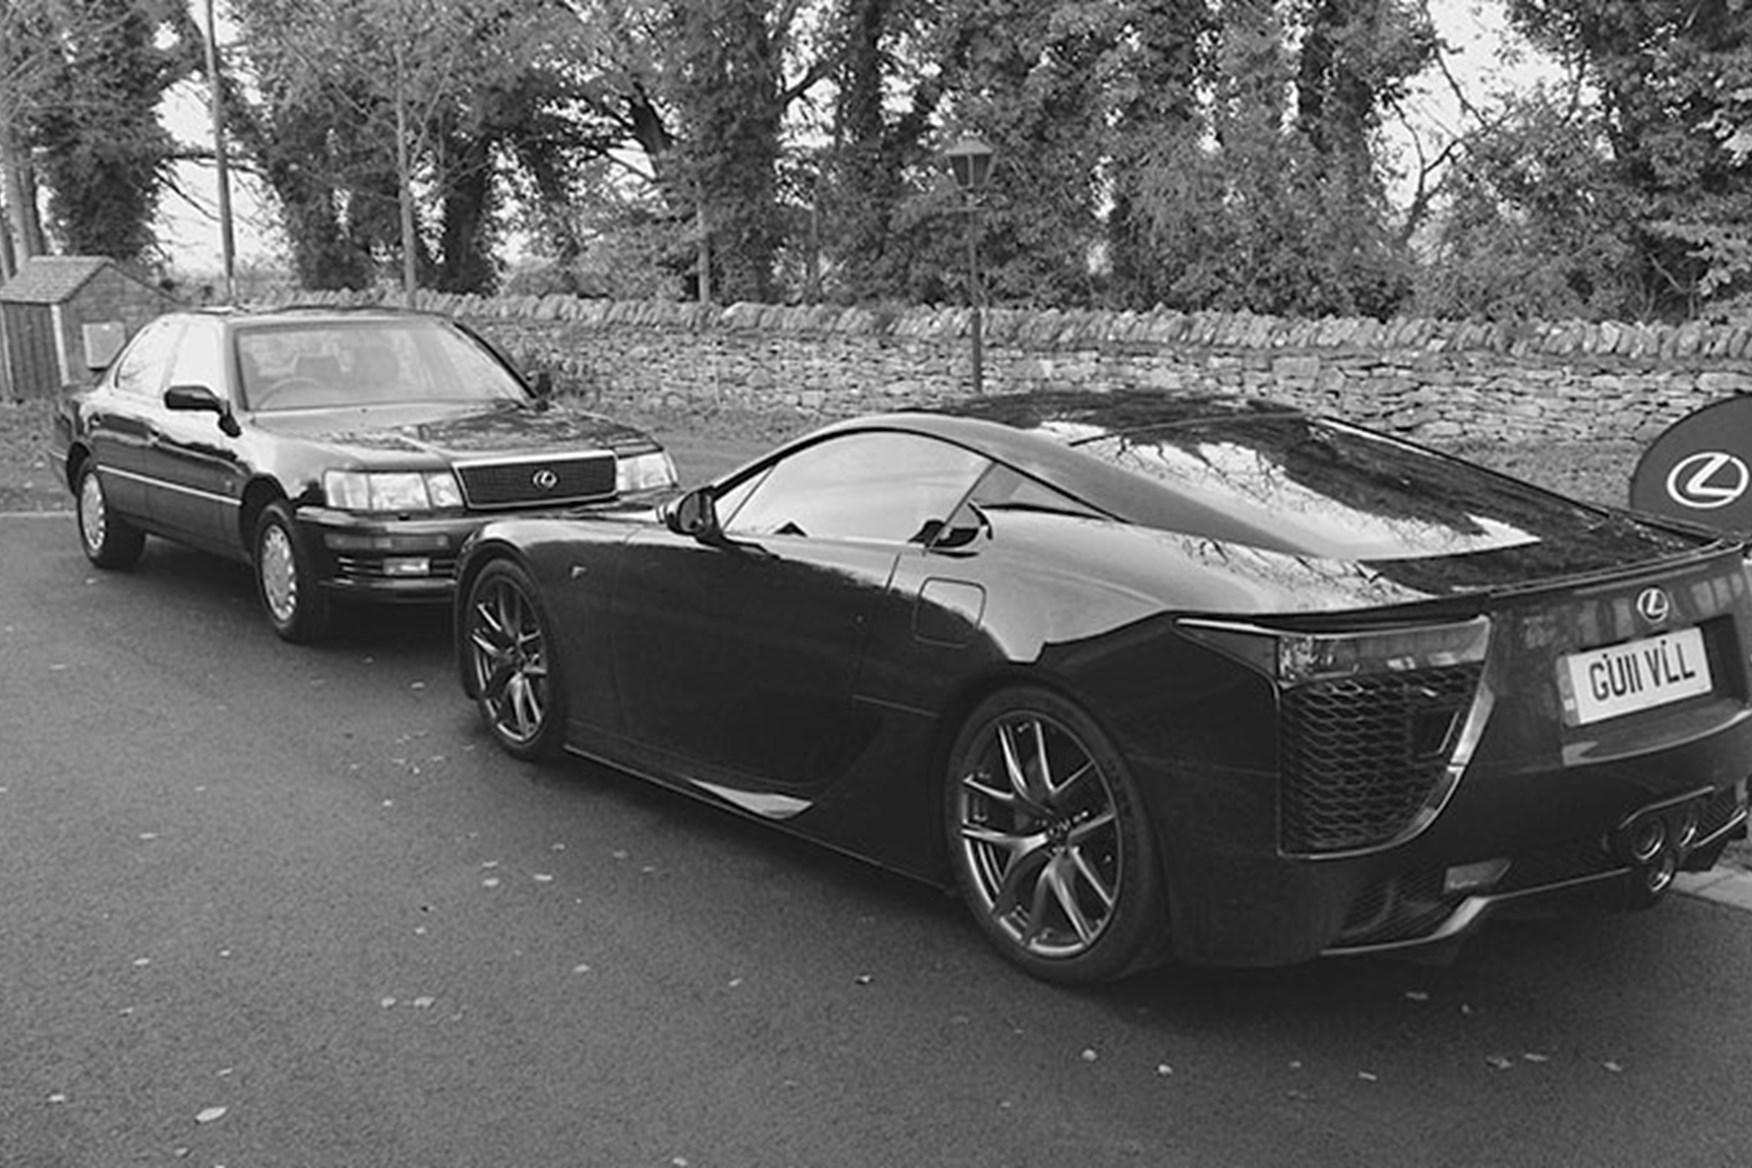 Charmant ... Still Looking Great Today: The Lexus LFA Supercar